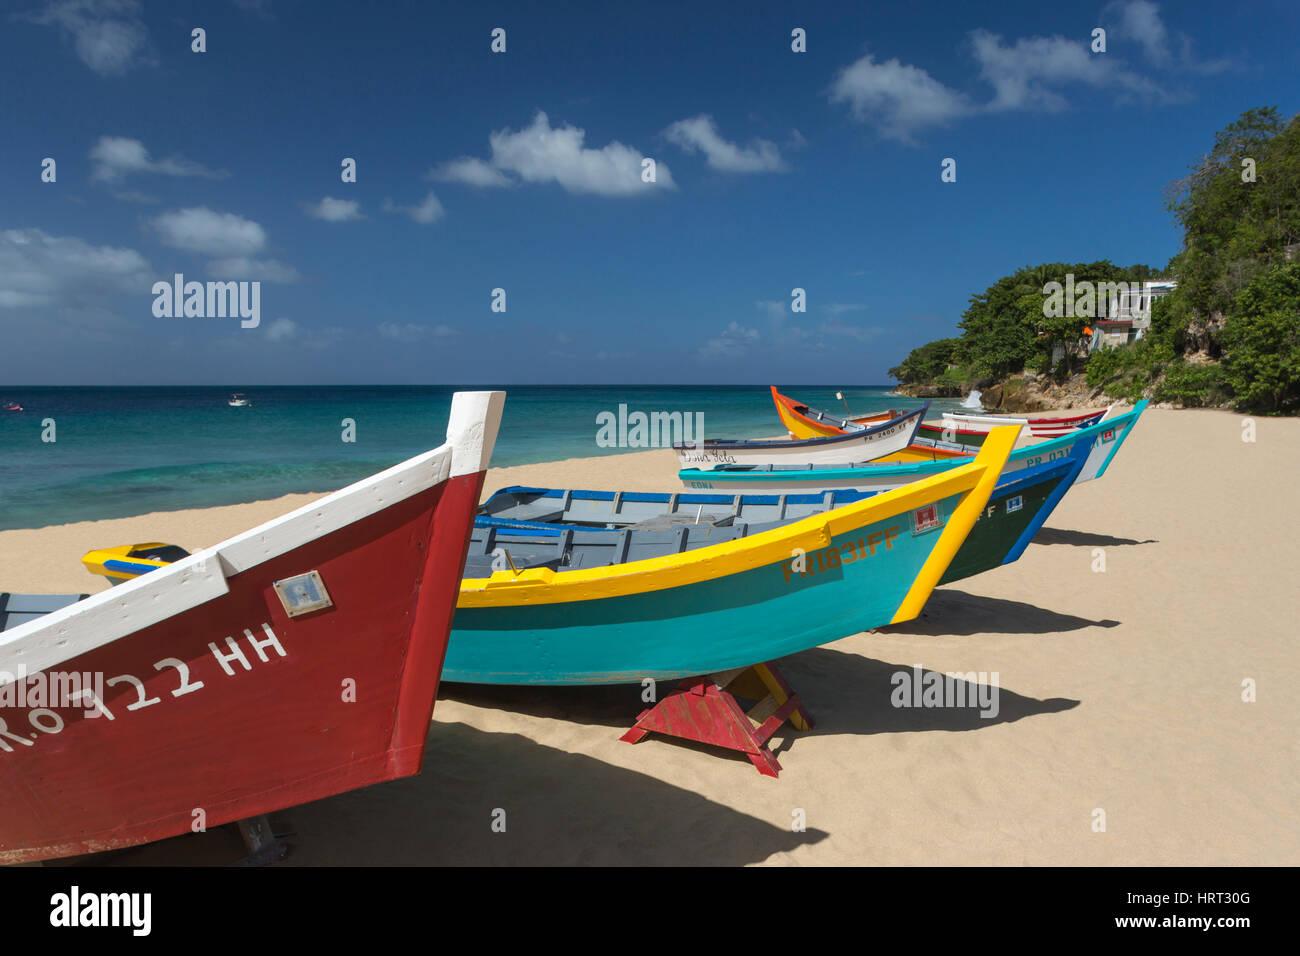 ROW OF BRIGHTLY PAINTED YOLA FISHING BOATS CRASH BOAT BEACH AGUADILLA PUERTO RICO - Stock Image